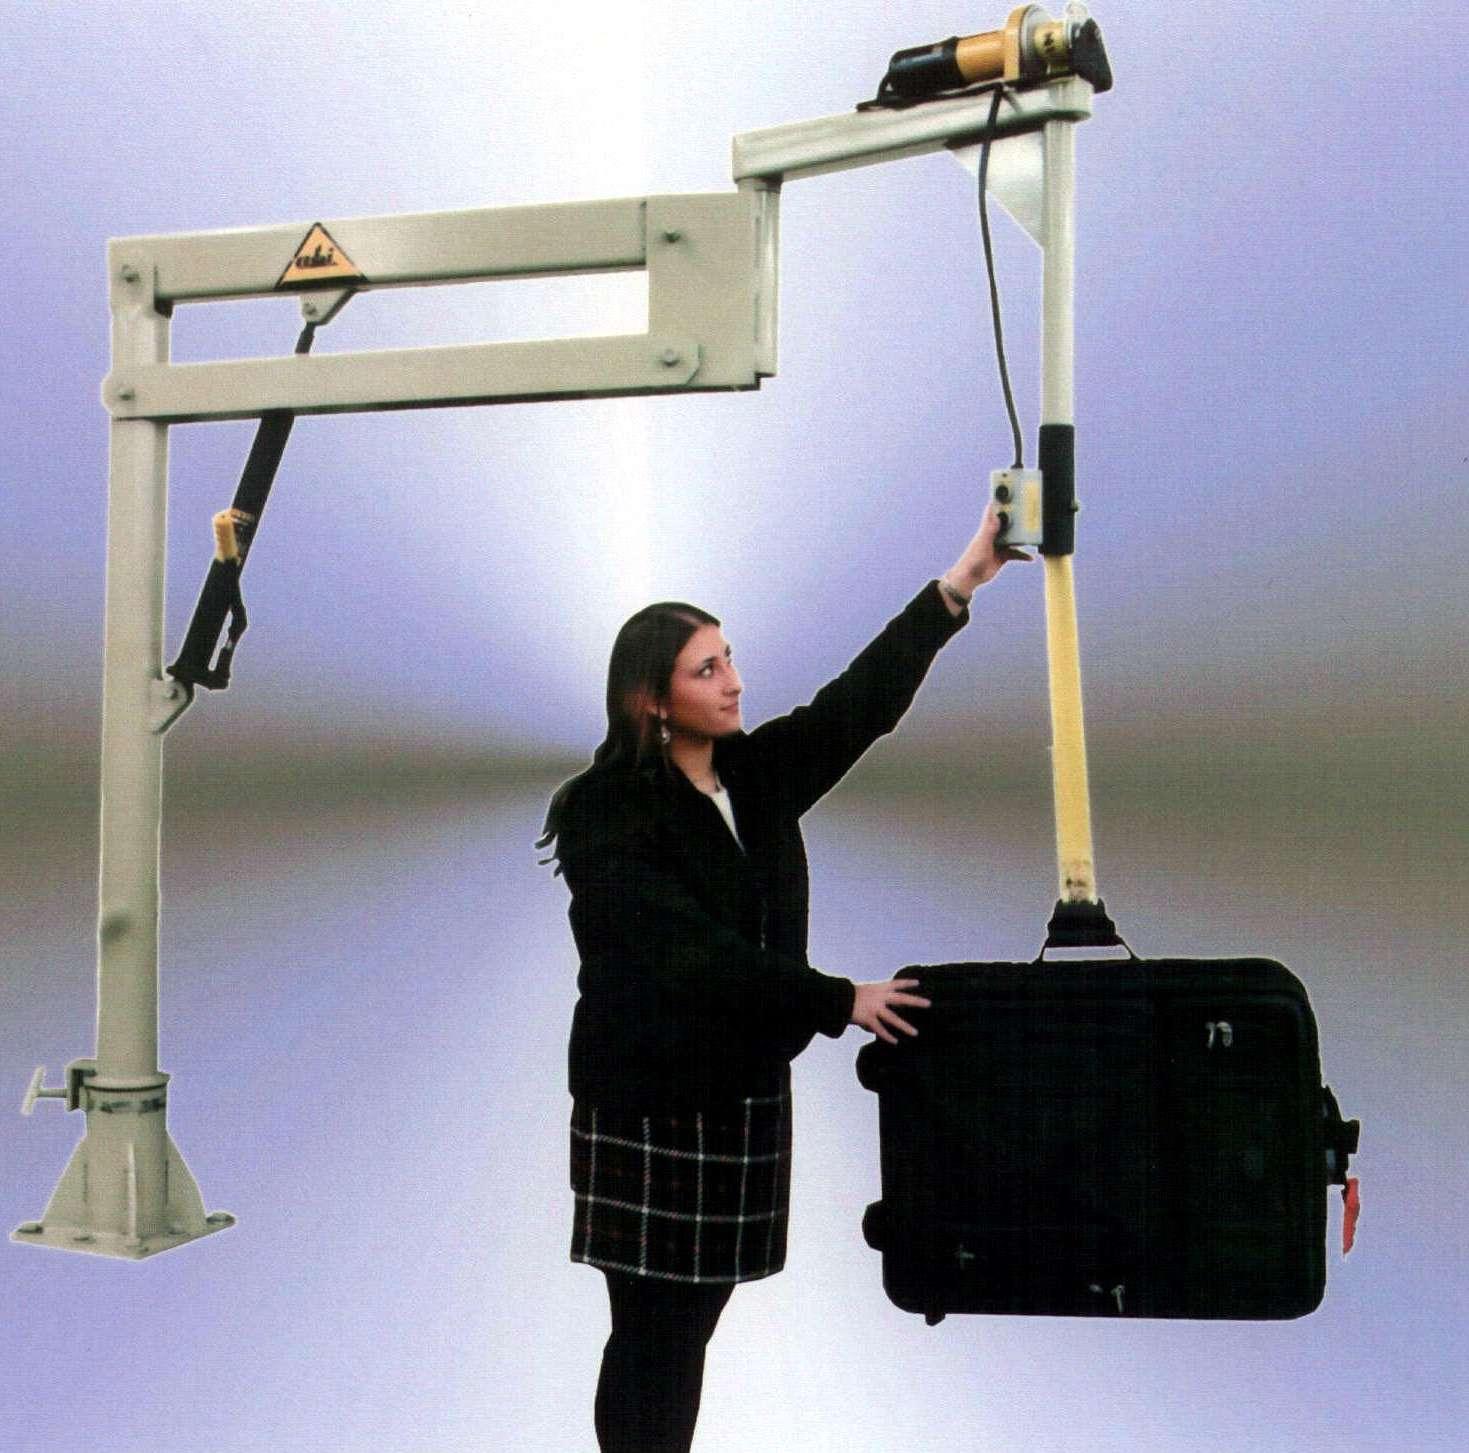 Ergonomic Industrial Manipulator : New luggage handling ergonomic manipulator simple fast